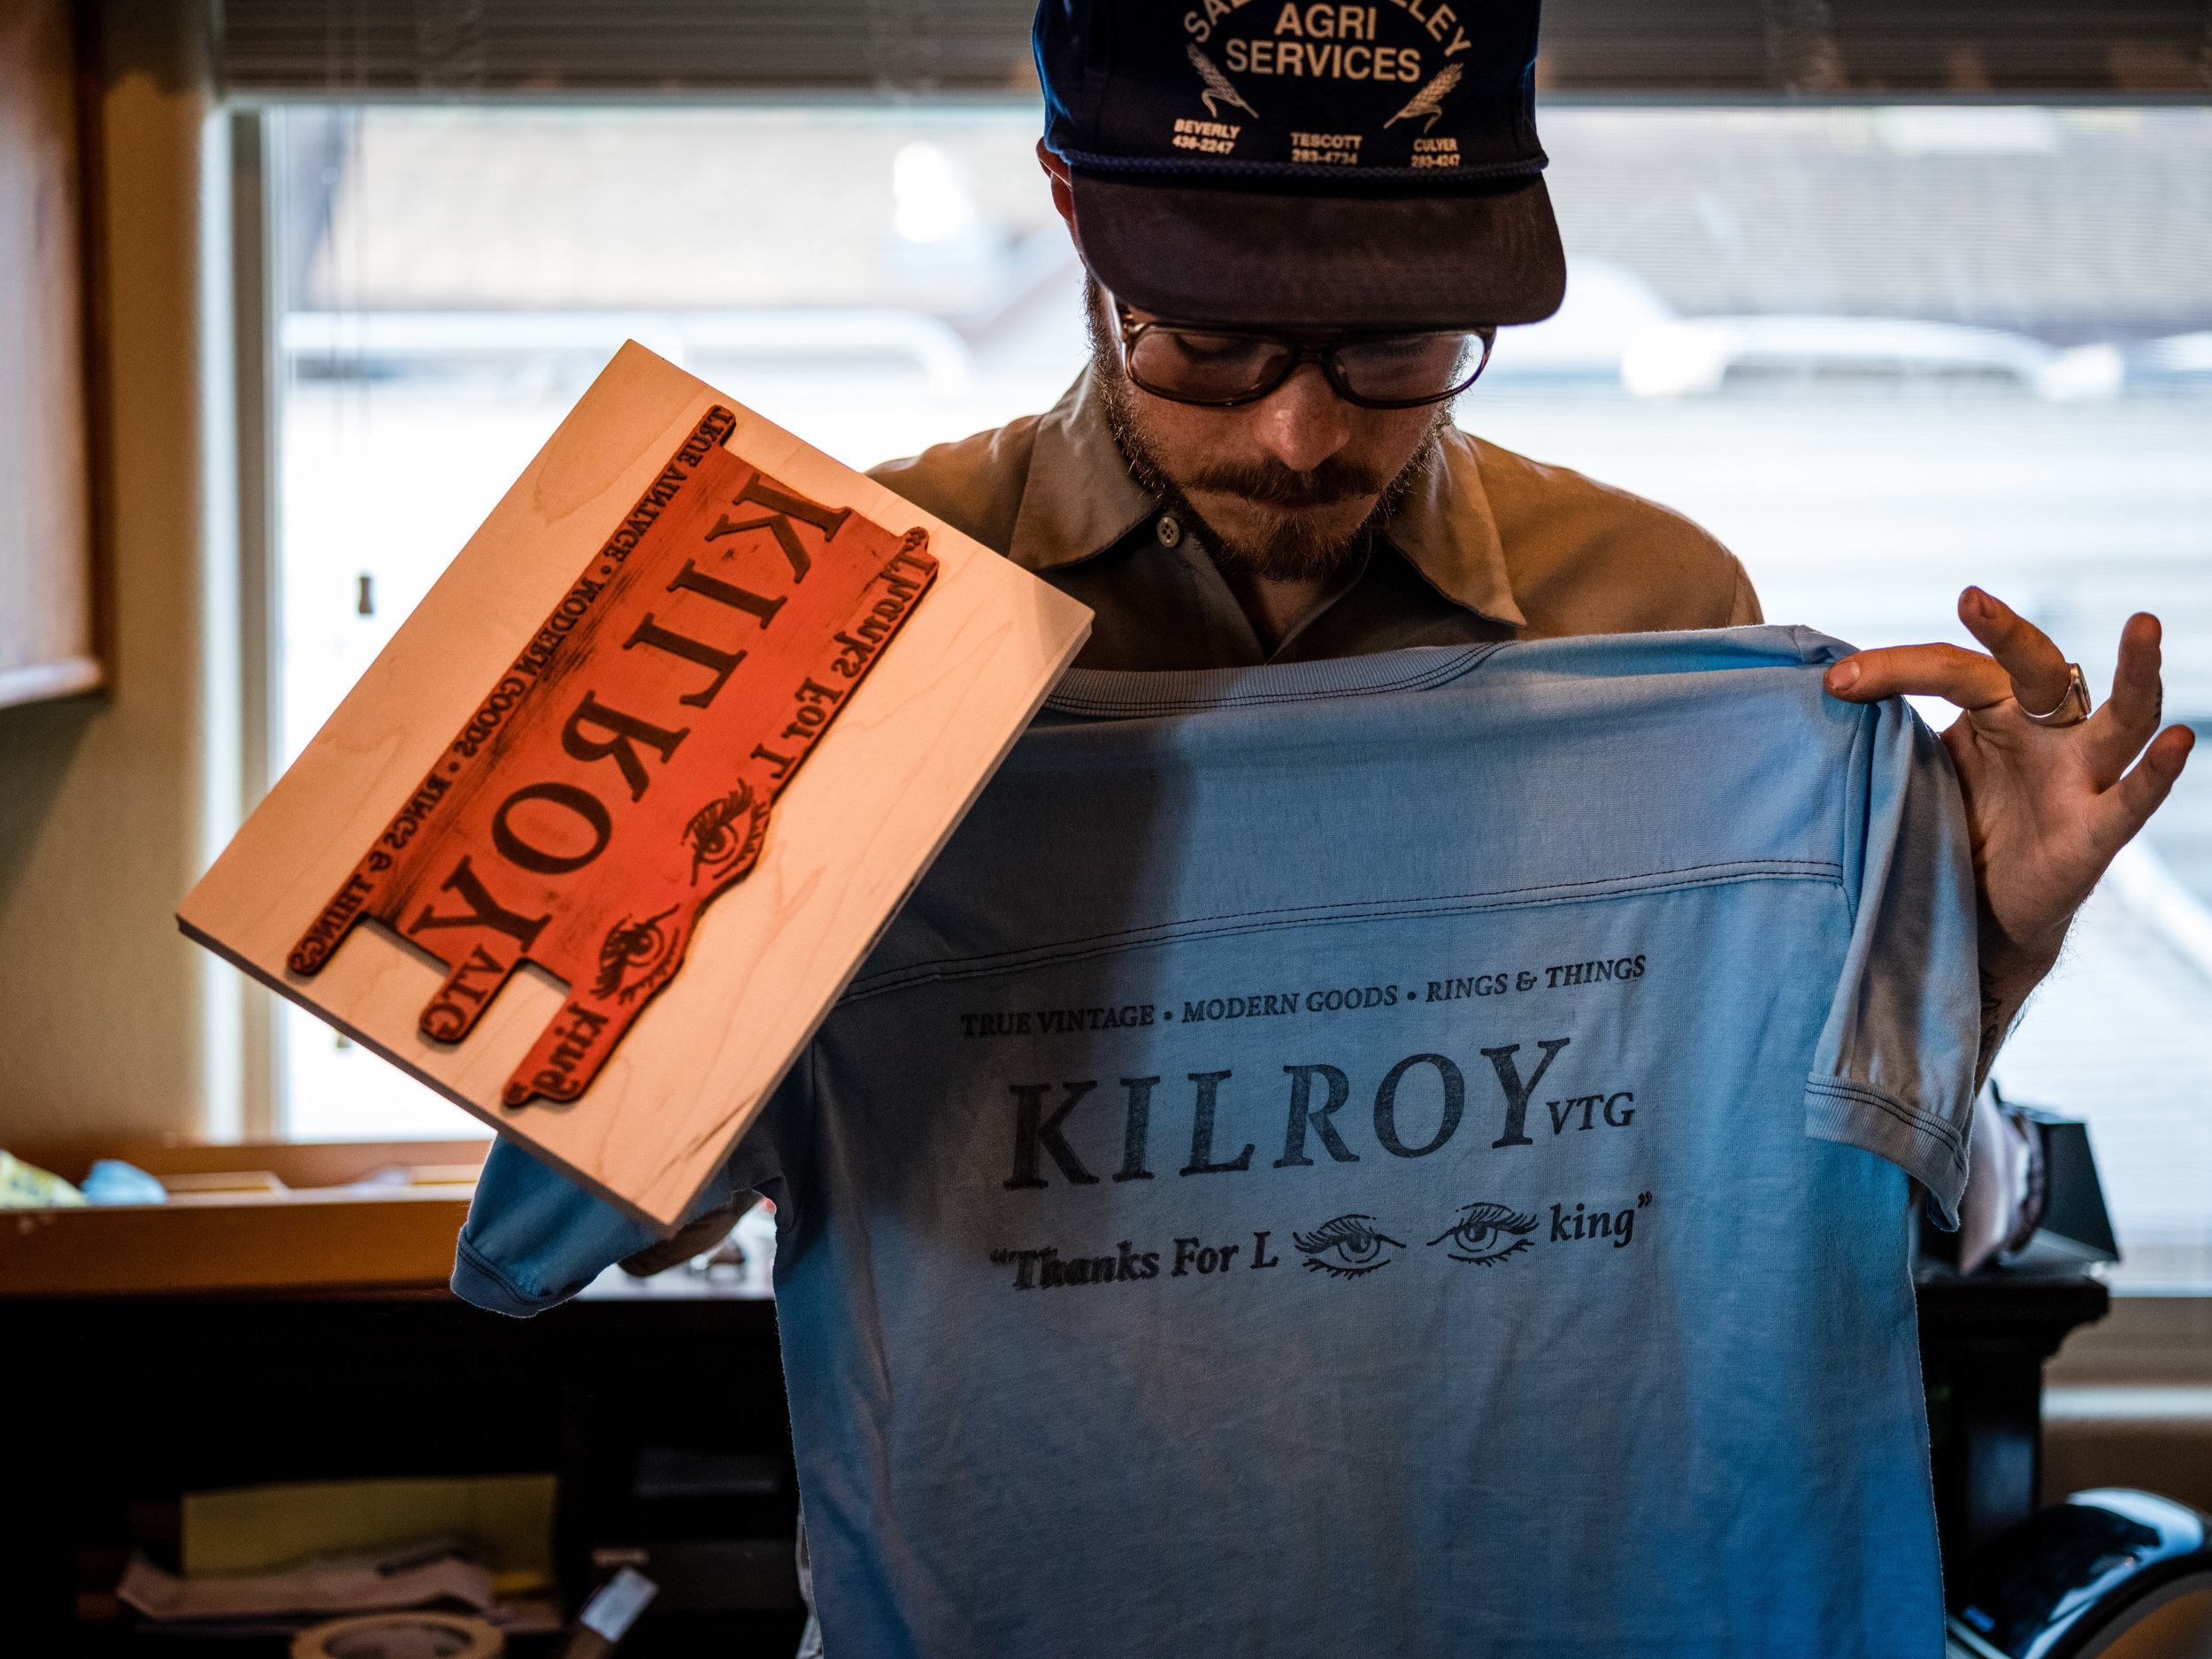 Kelley_Shirt stamp_Kilroy vtg_Ryland West.jpg